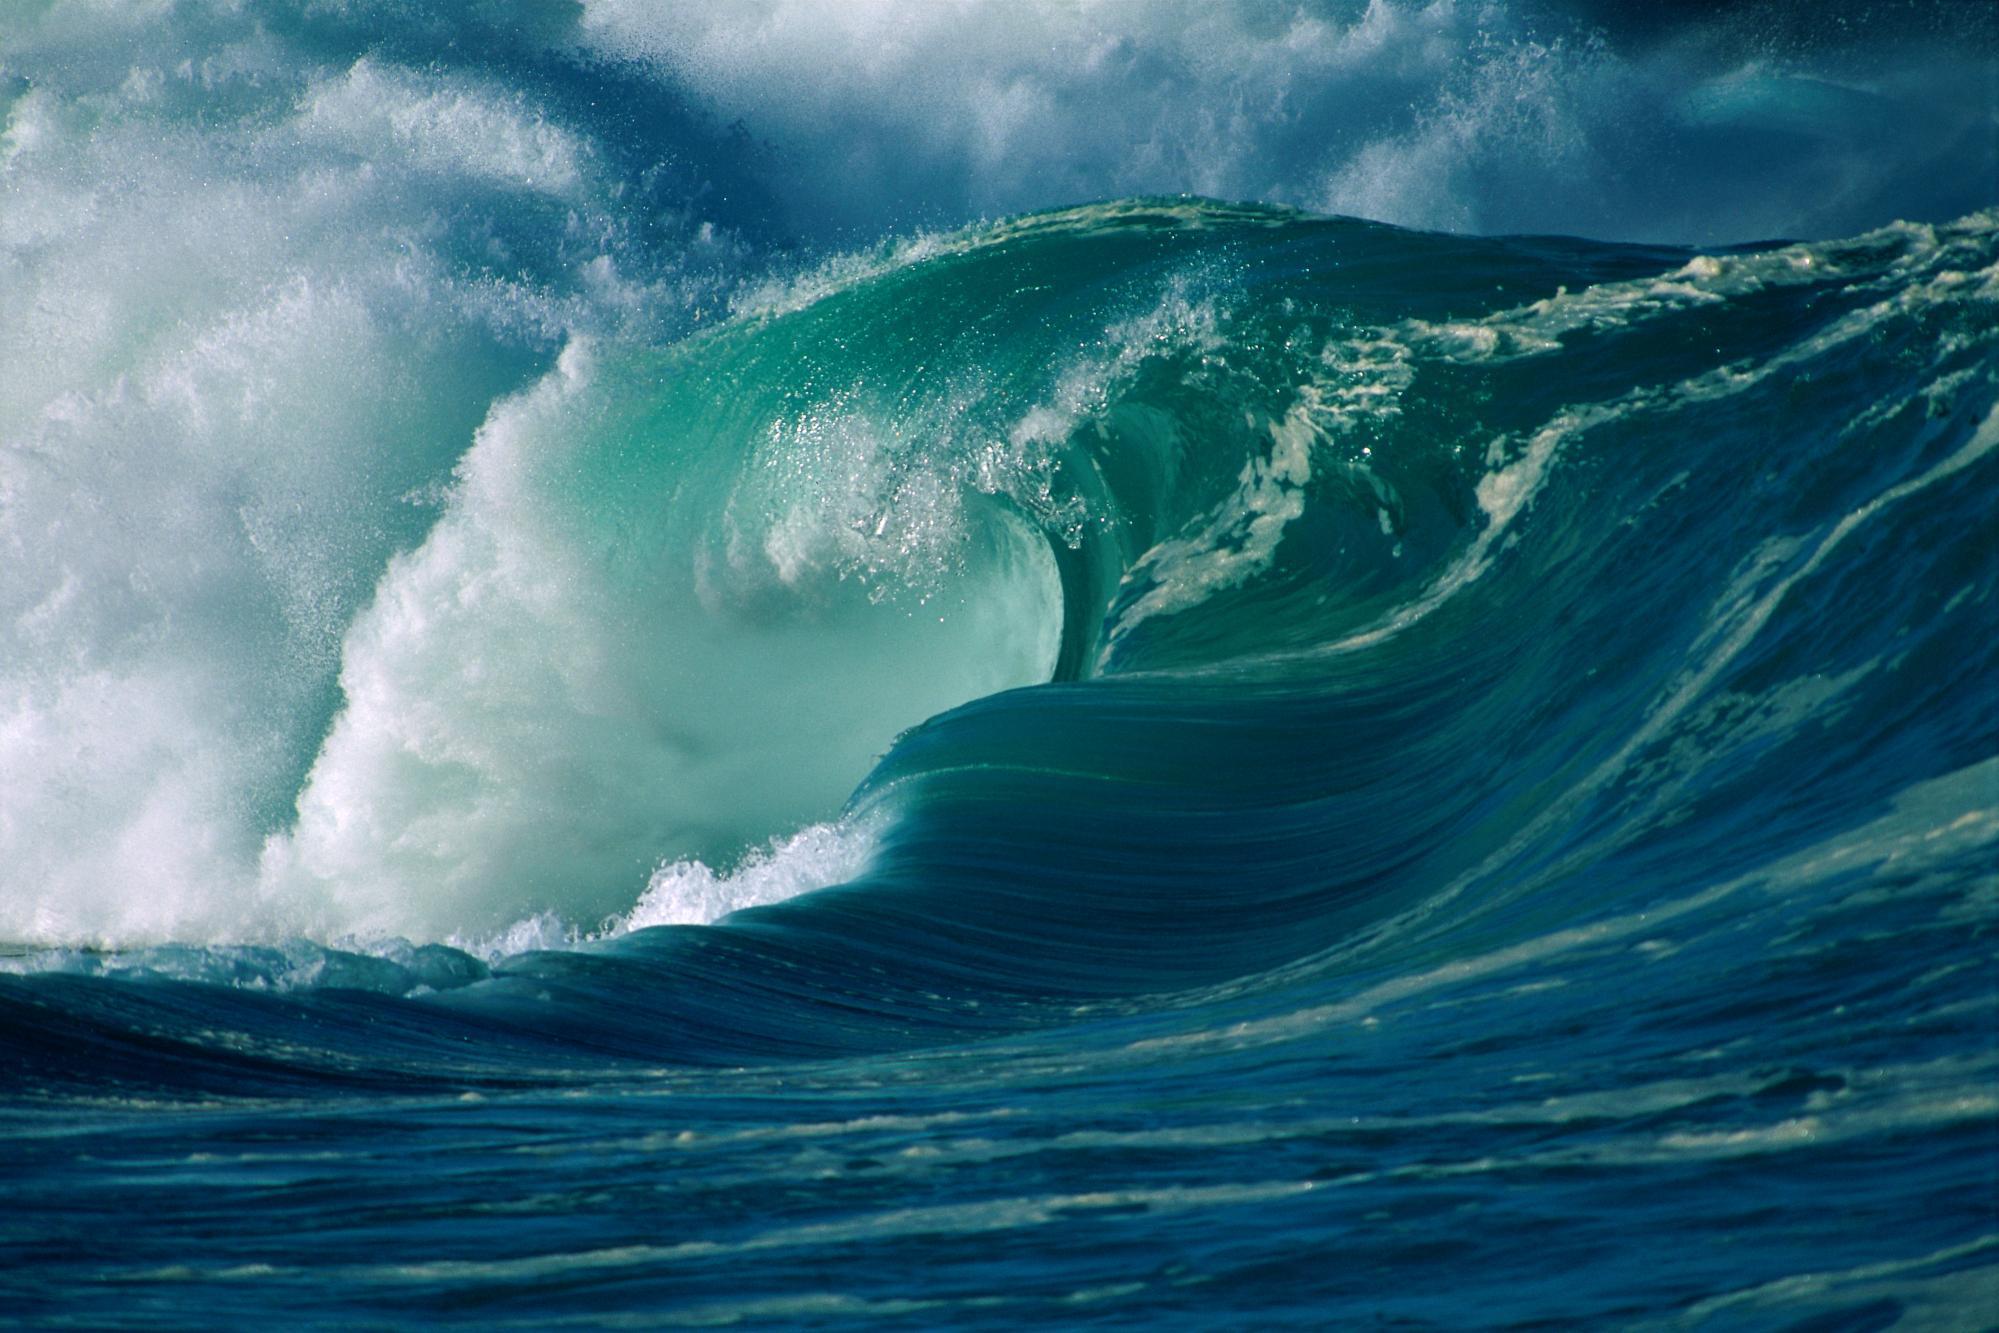 ocean waves wallpaper i14jpg   AdventureAmigosnet   AdventureAmigos 1999x1333